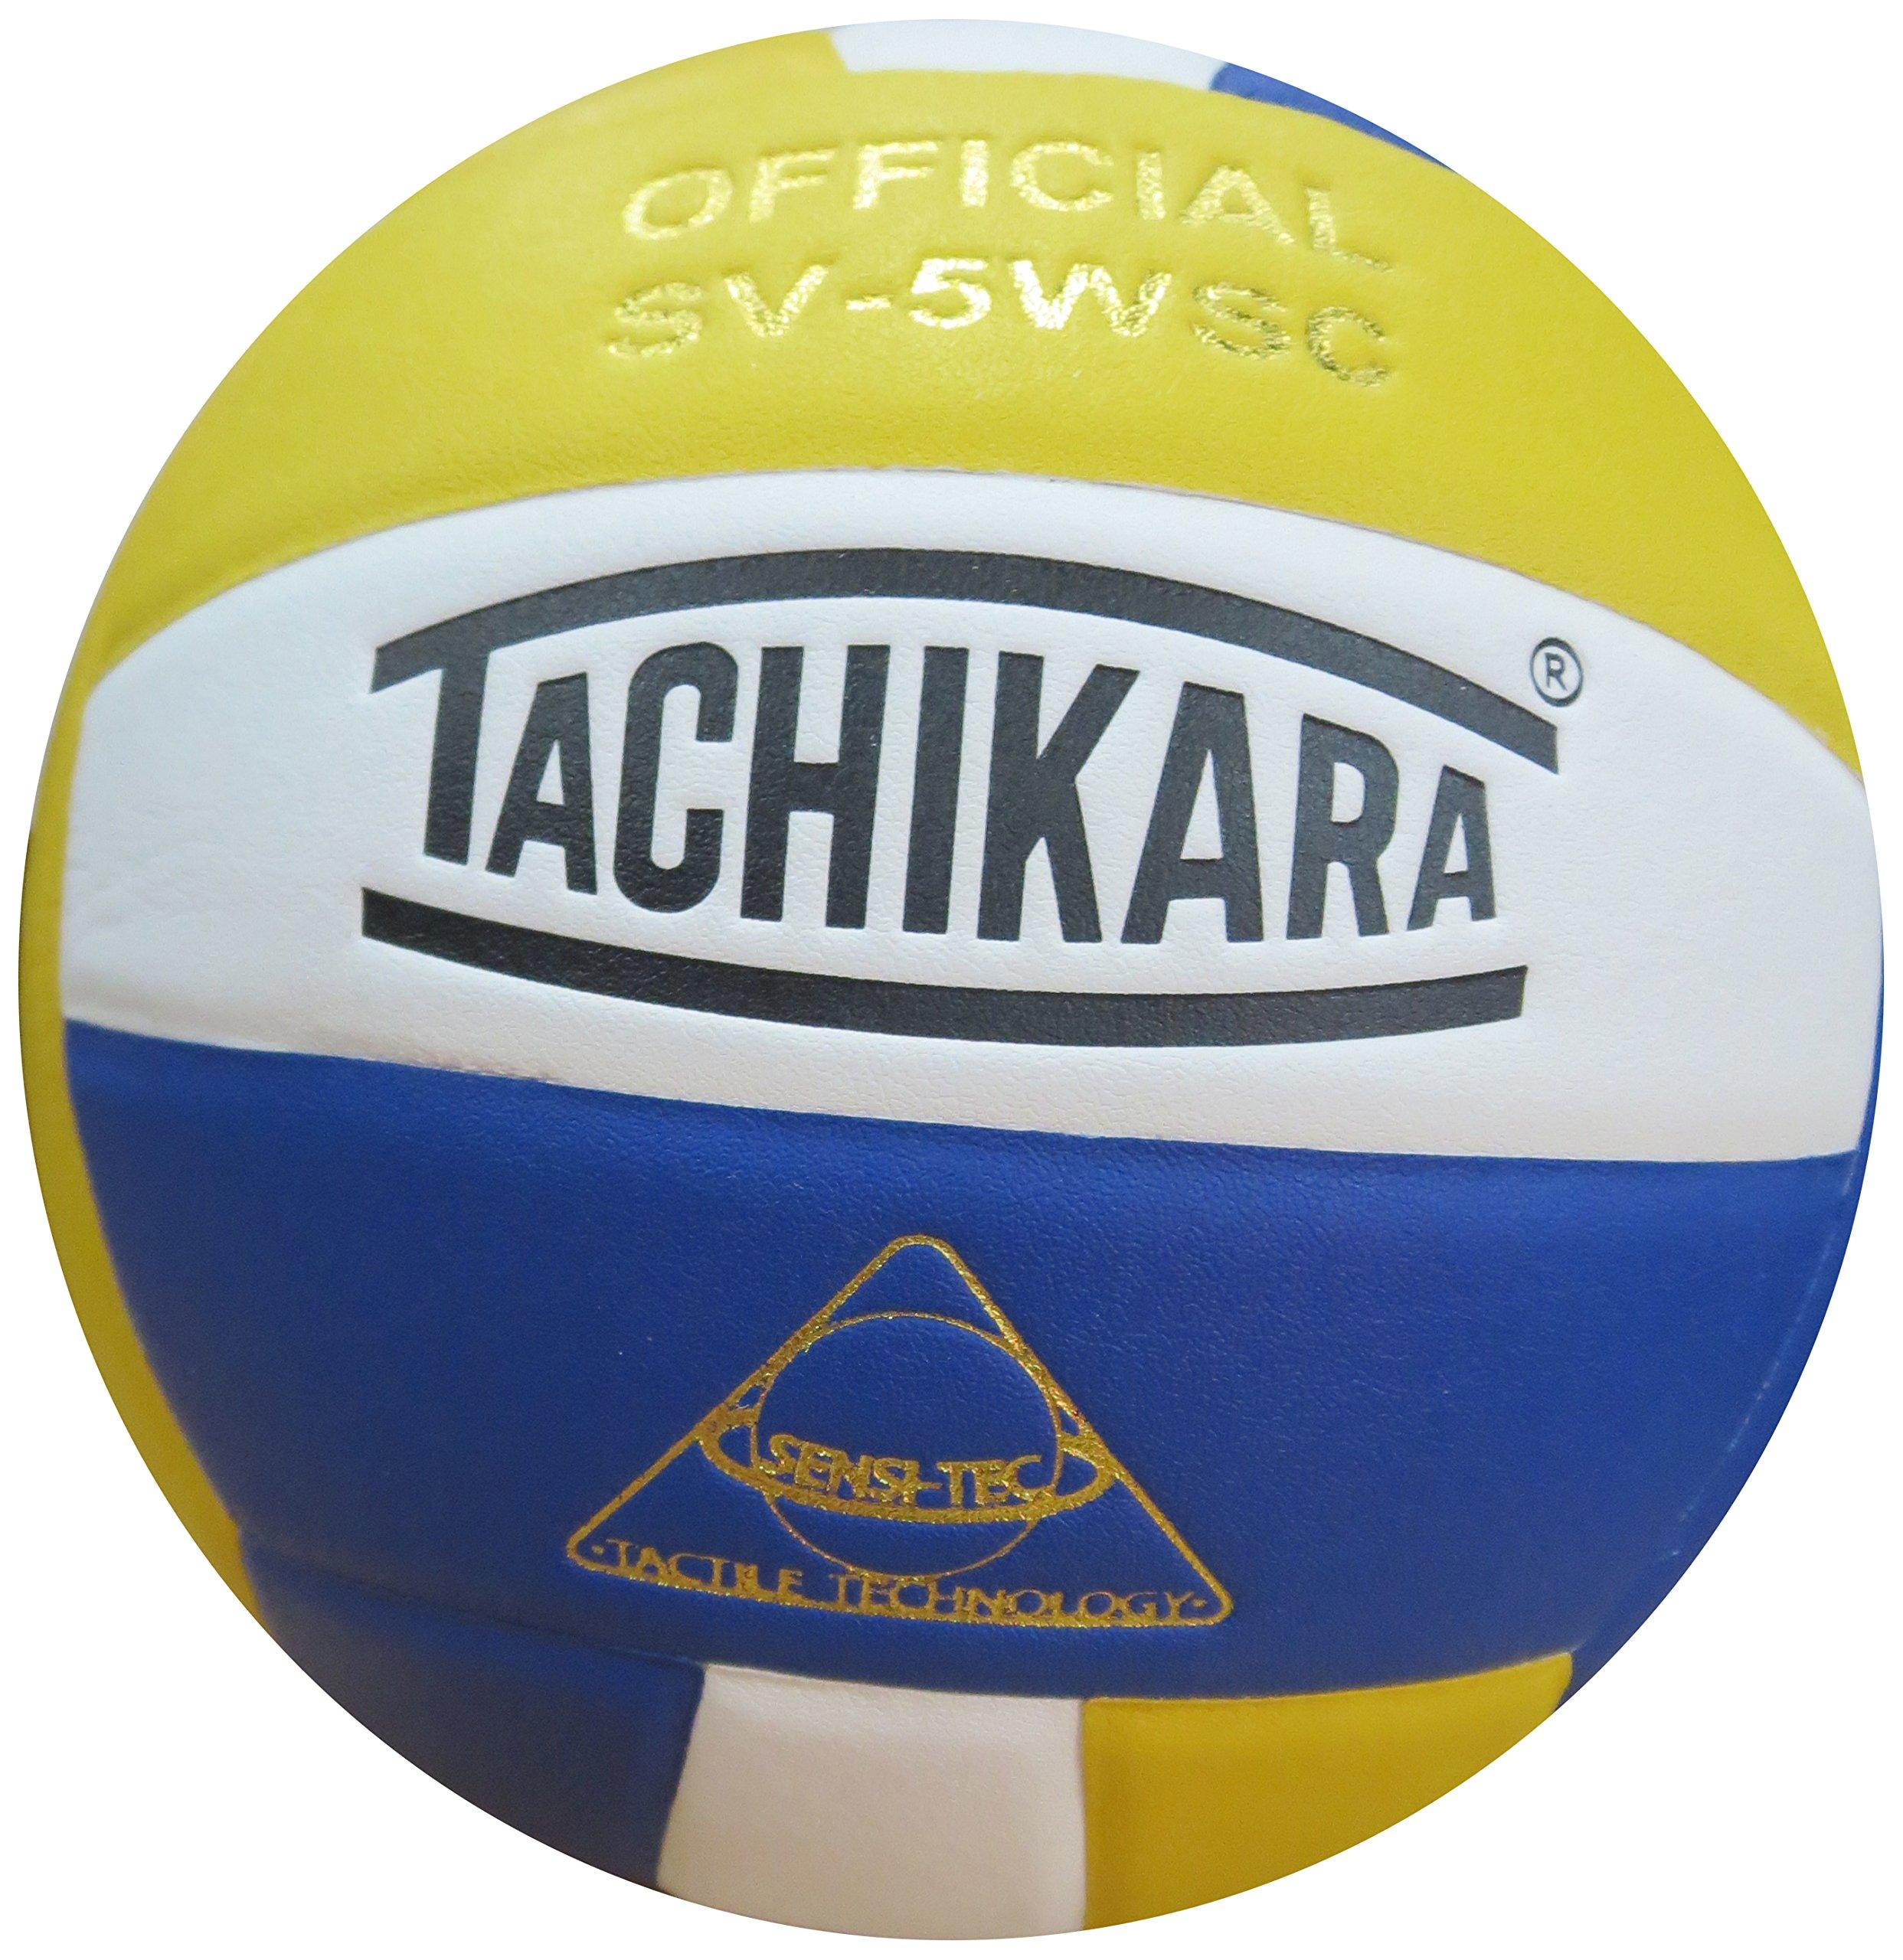 Tachikara Sensi-Tec Composite High Performance Volleyball (Royal/White/Gold) by TACHIKARA